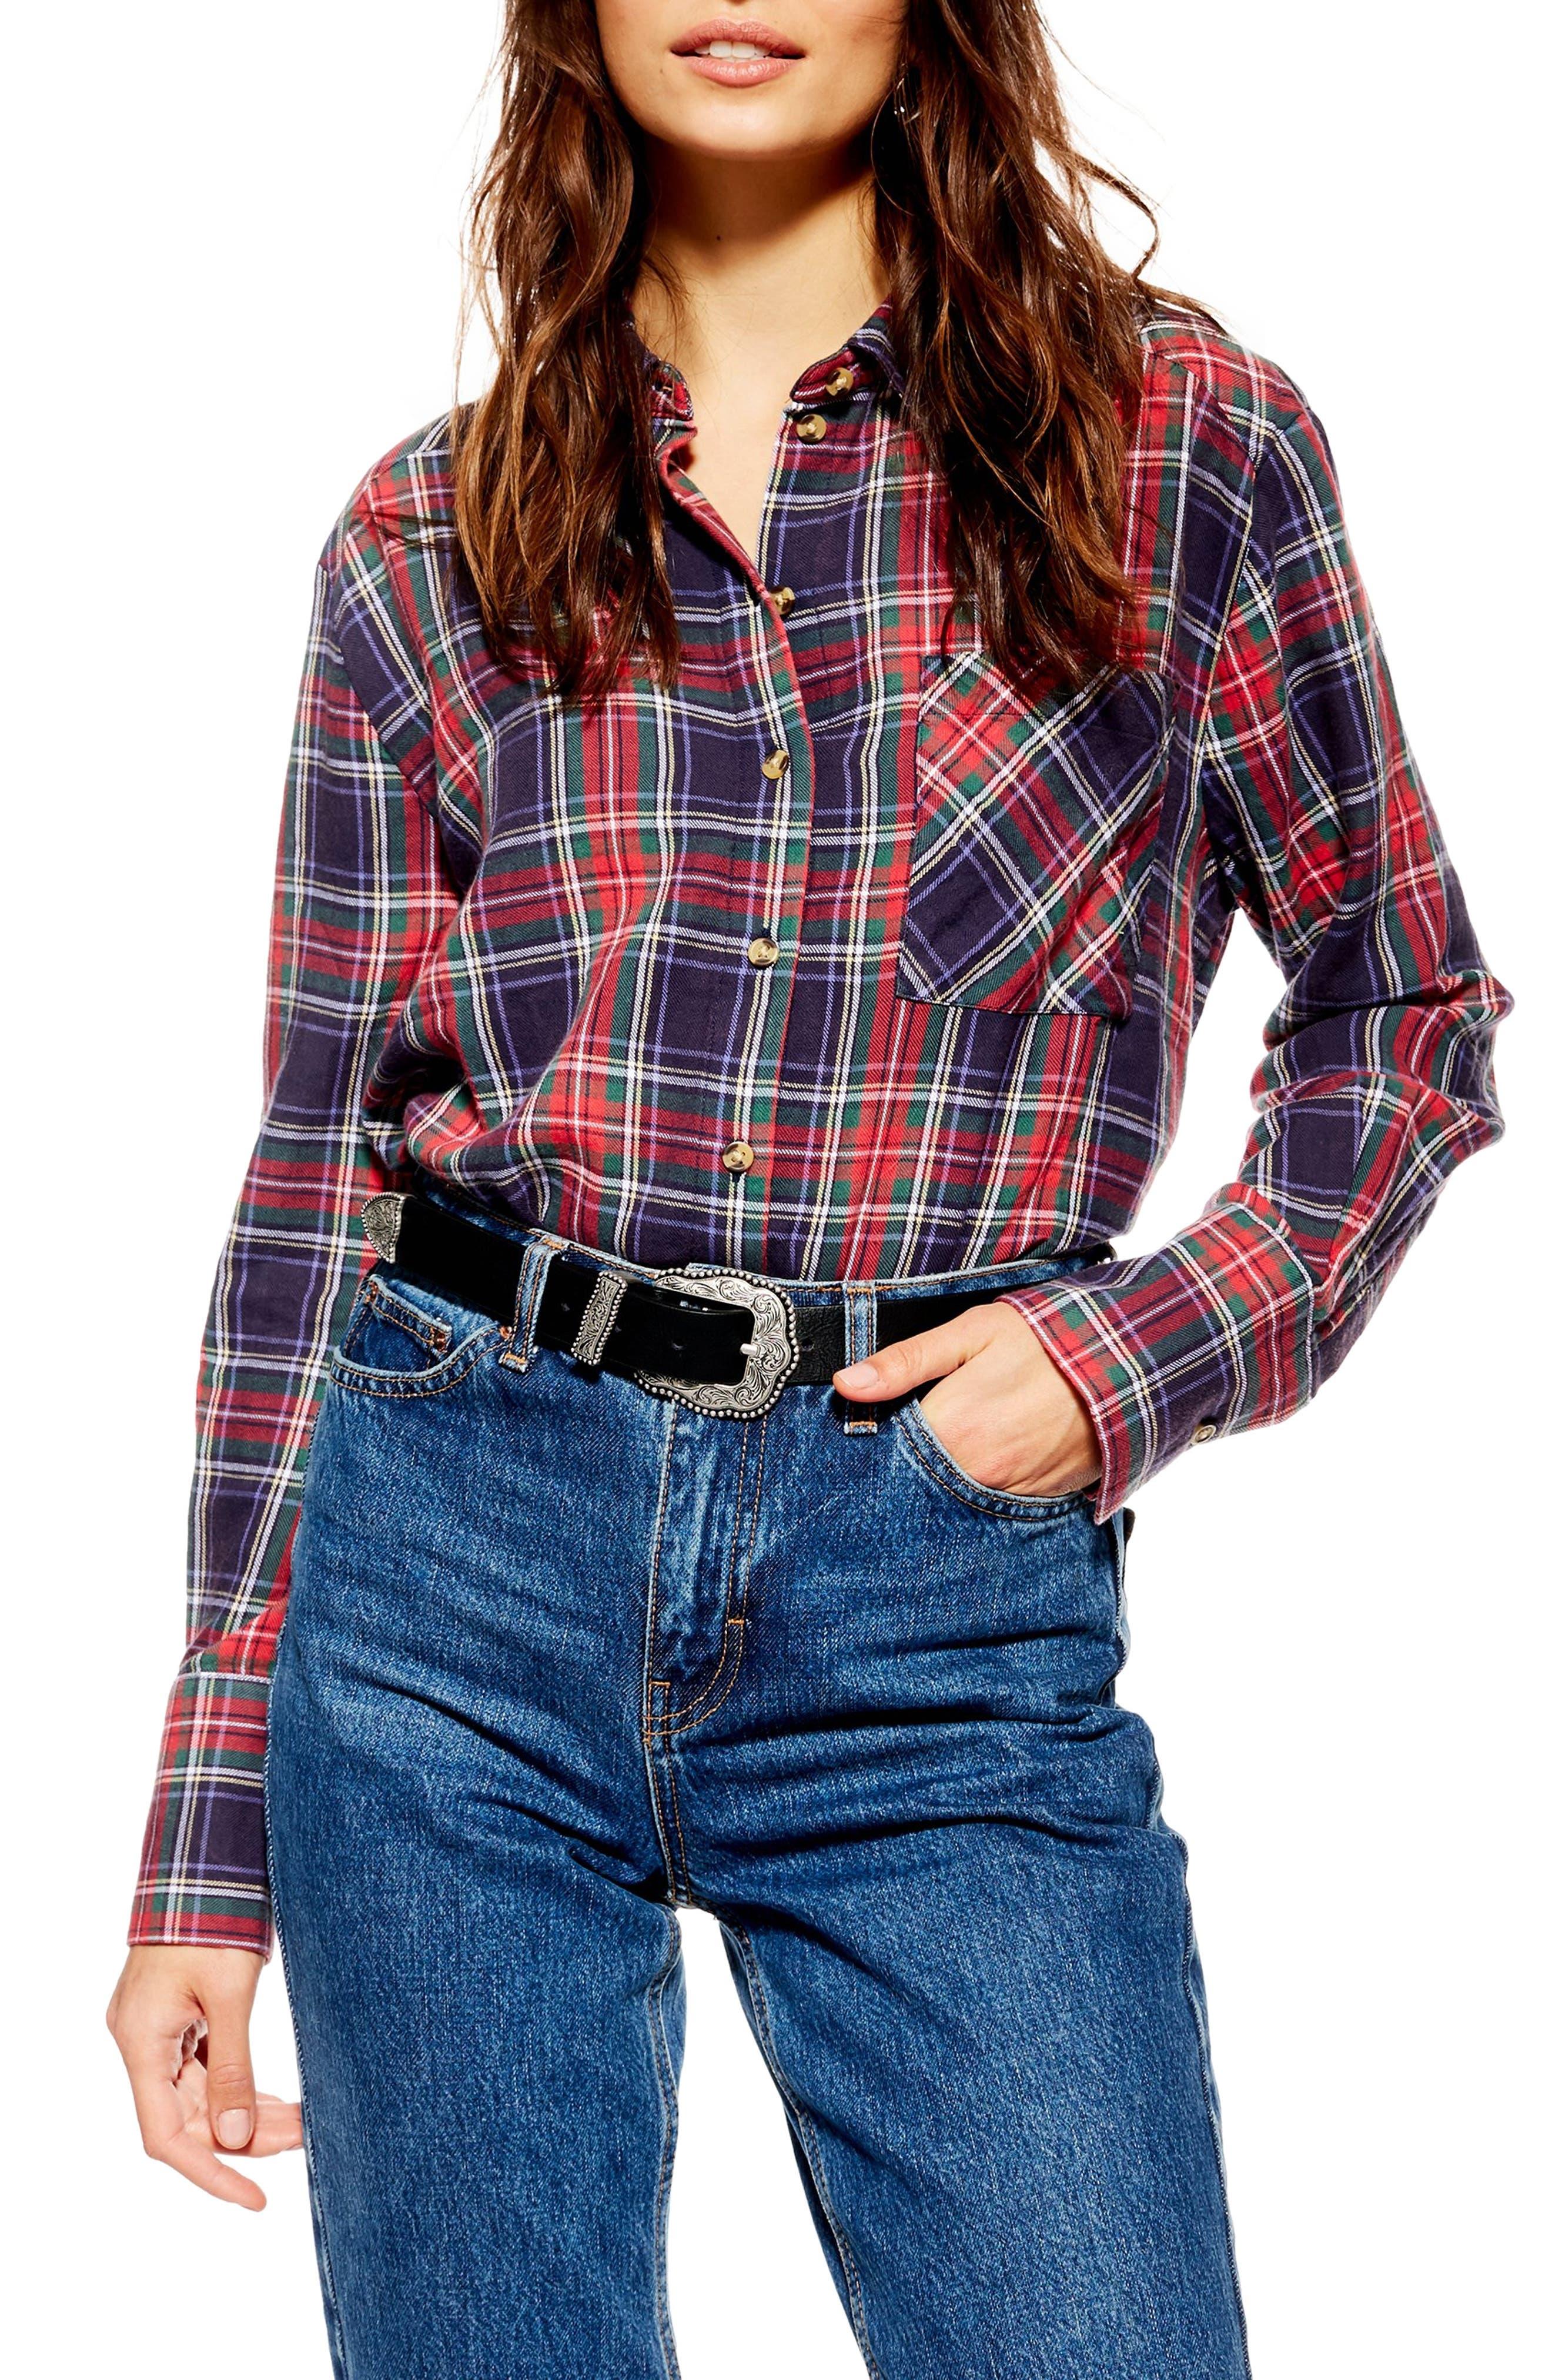 Pacey Washed Check Plaid Shirt,                             Main thumbnail 1, color,                             NAVY BLUE MULTI